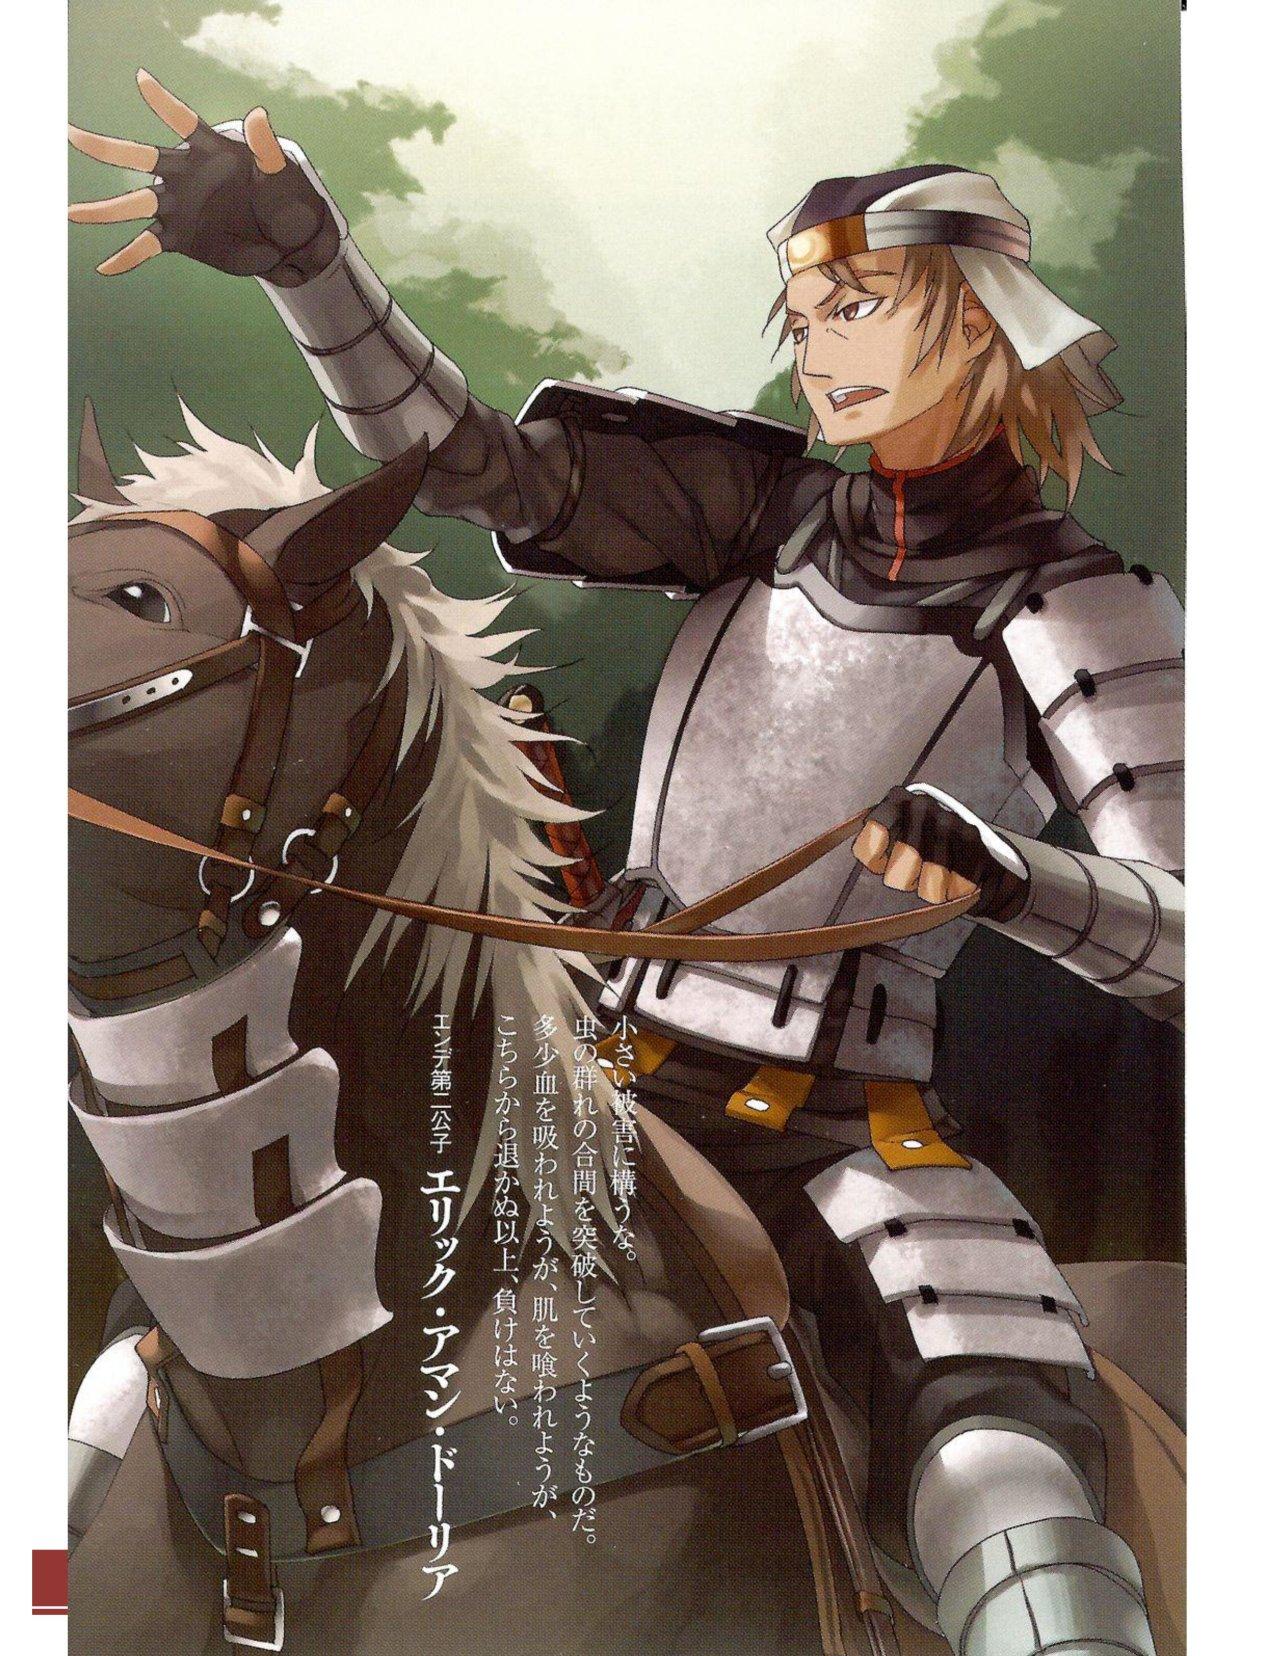 https://c10.mangatag.com/es_manga/pic5/22/25558/772022/441563c6e595fd83adac0038d66e6668.jpg Page 9